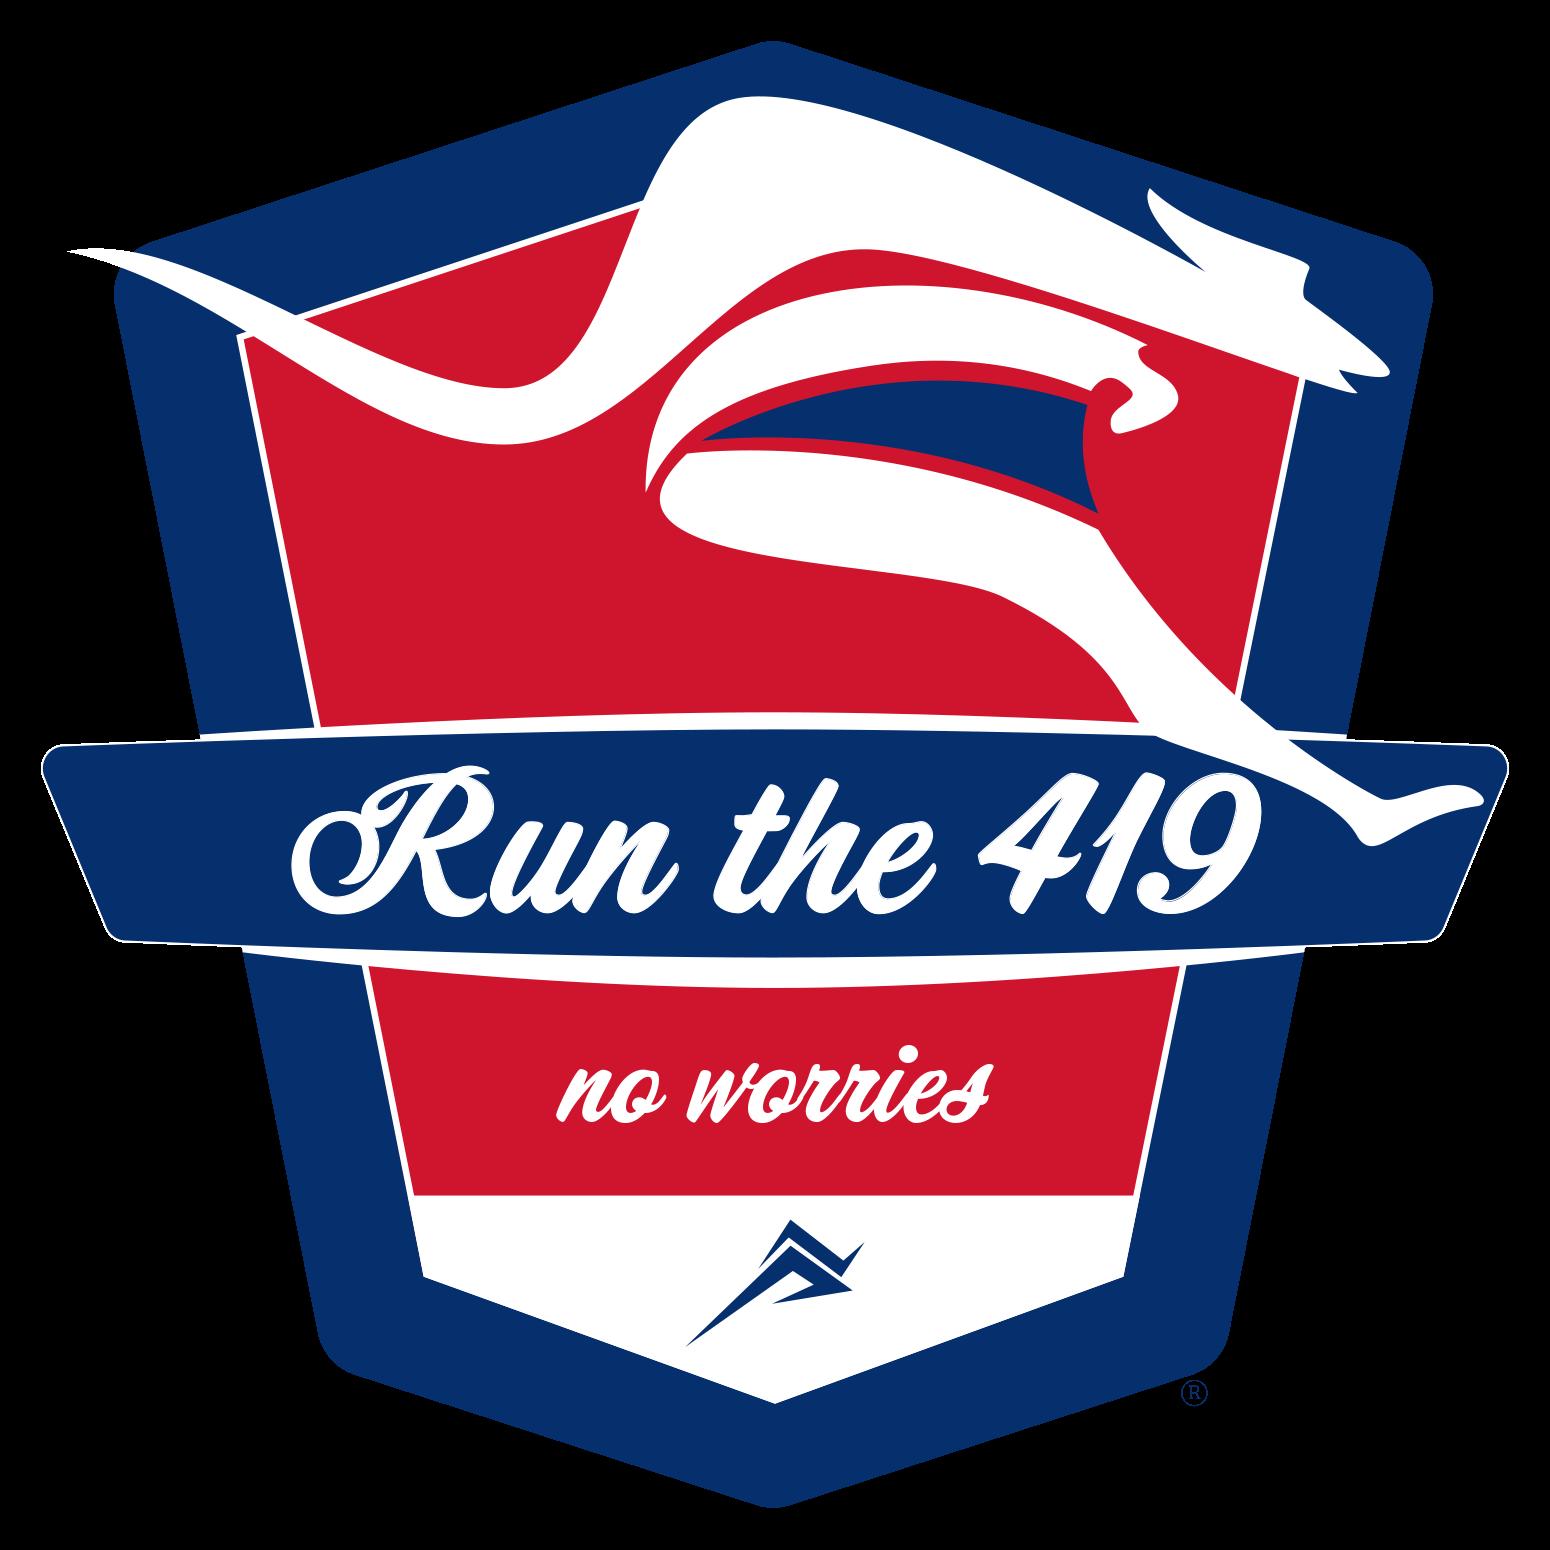 Run the 419